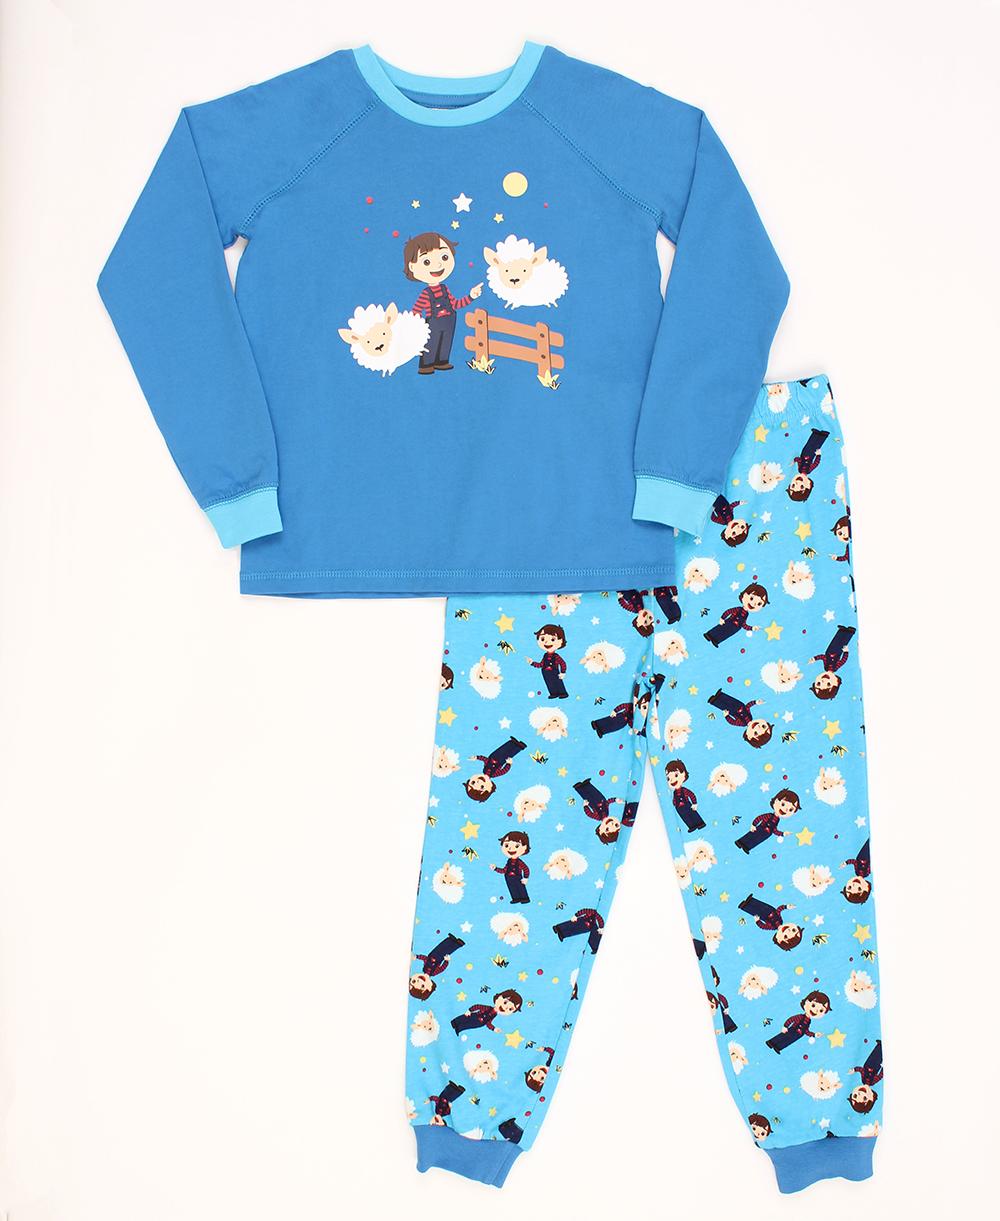 Passe-Partout - Pyjama Pruneau 7-8 ans